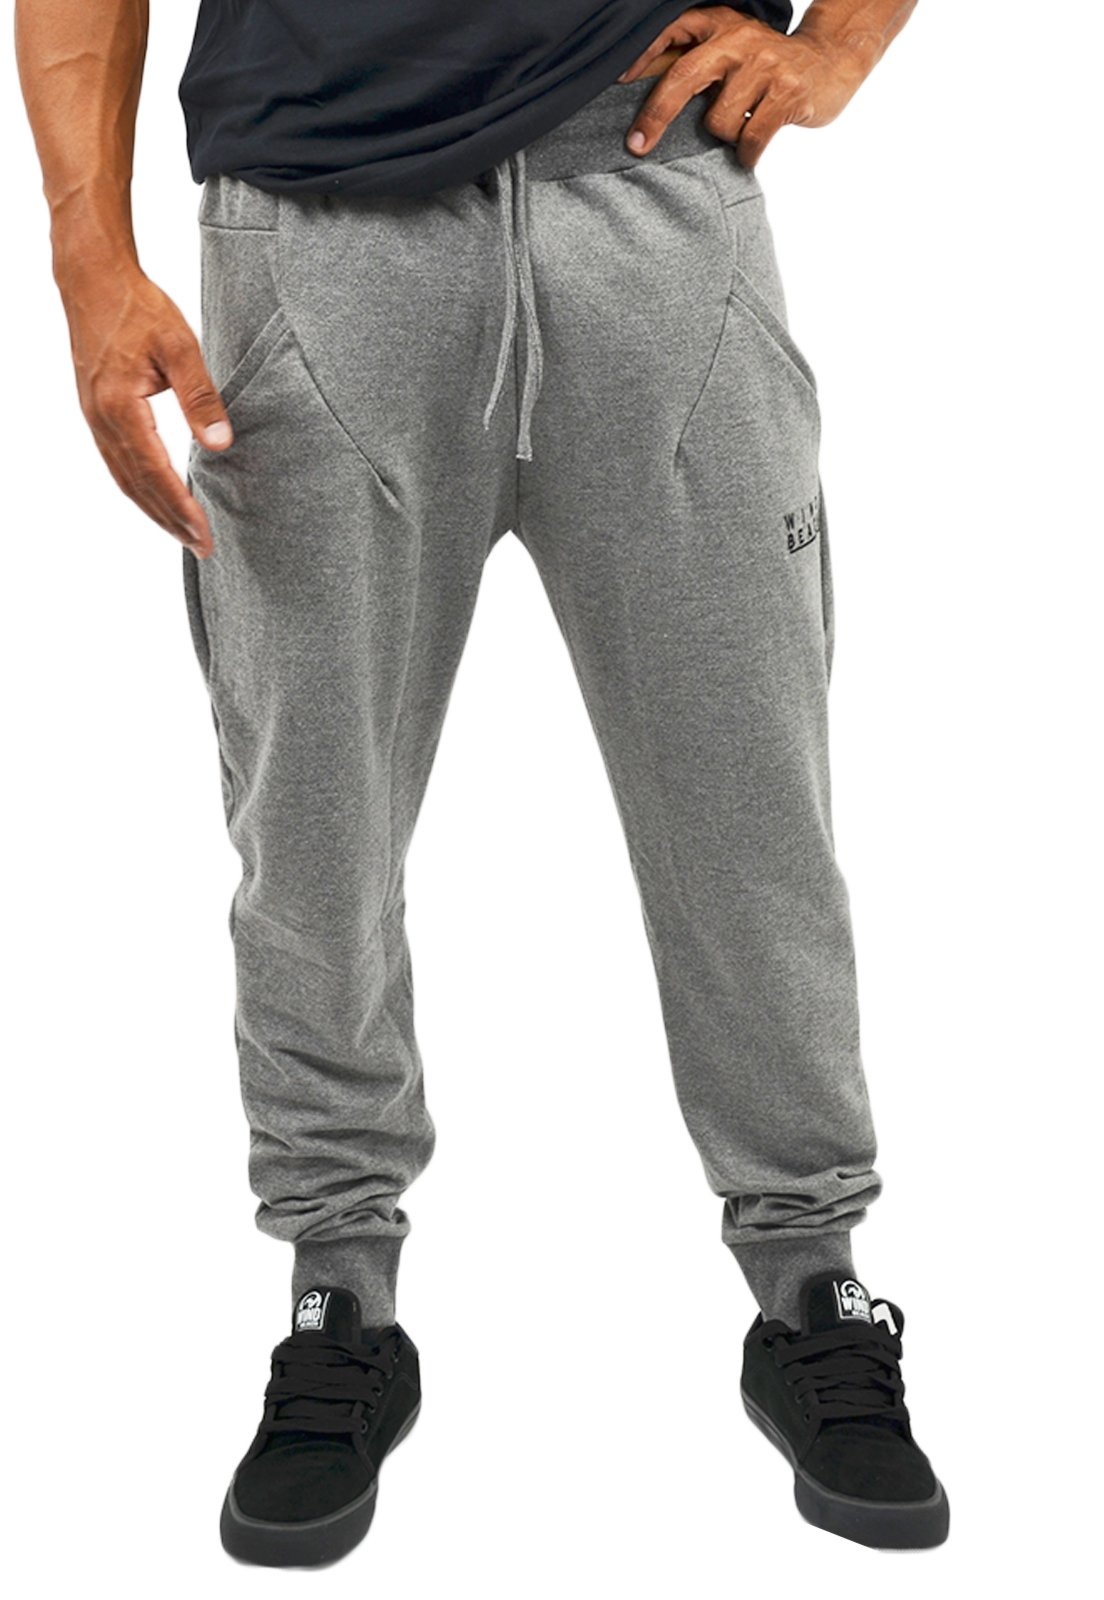 Bermuda saruel masculina jpg 1104x1600 Bermuda jeans saruel masculina 287f1d81f64